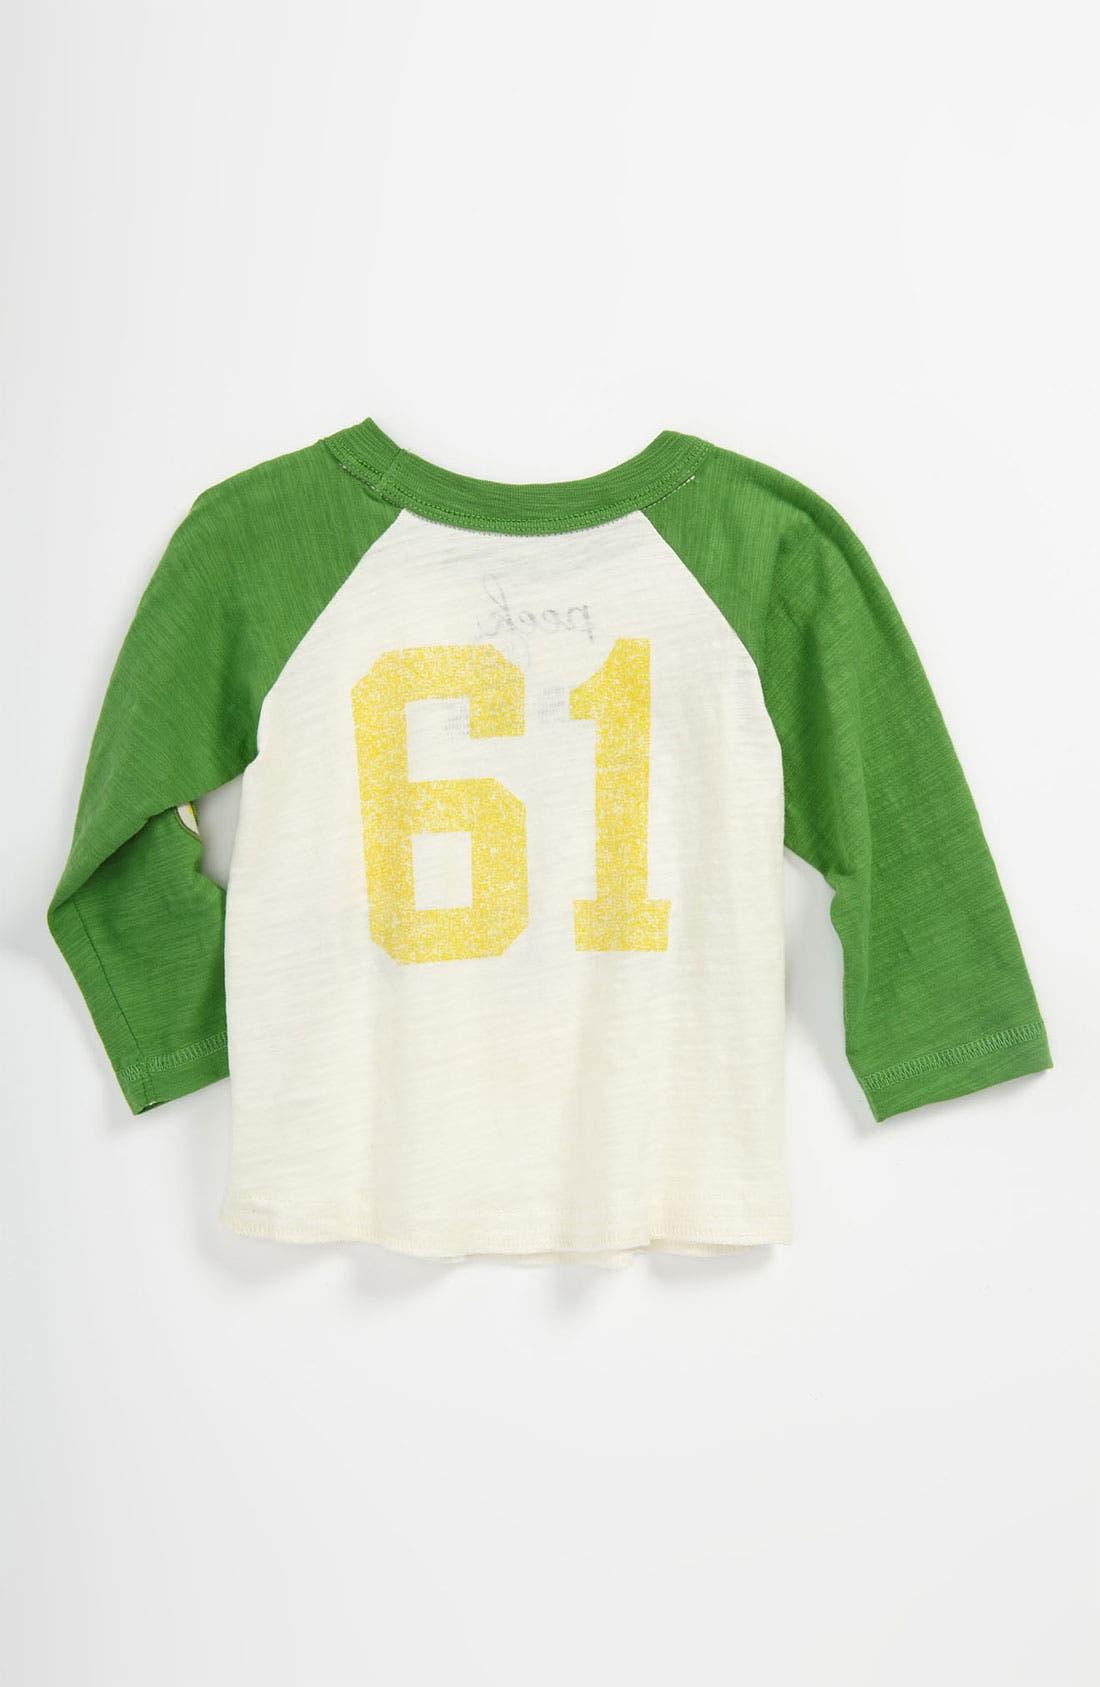 Alternate Image 2  - Peek 'Club Cienfuegos' Baseball Jersey T-Shirt (Baby)